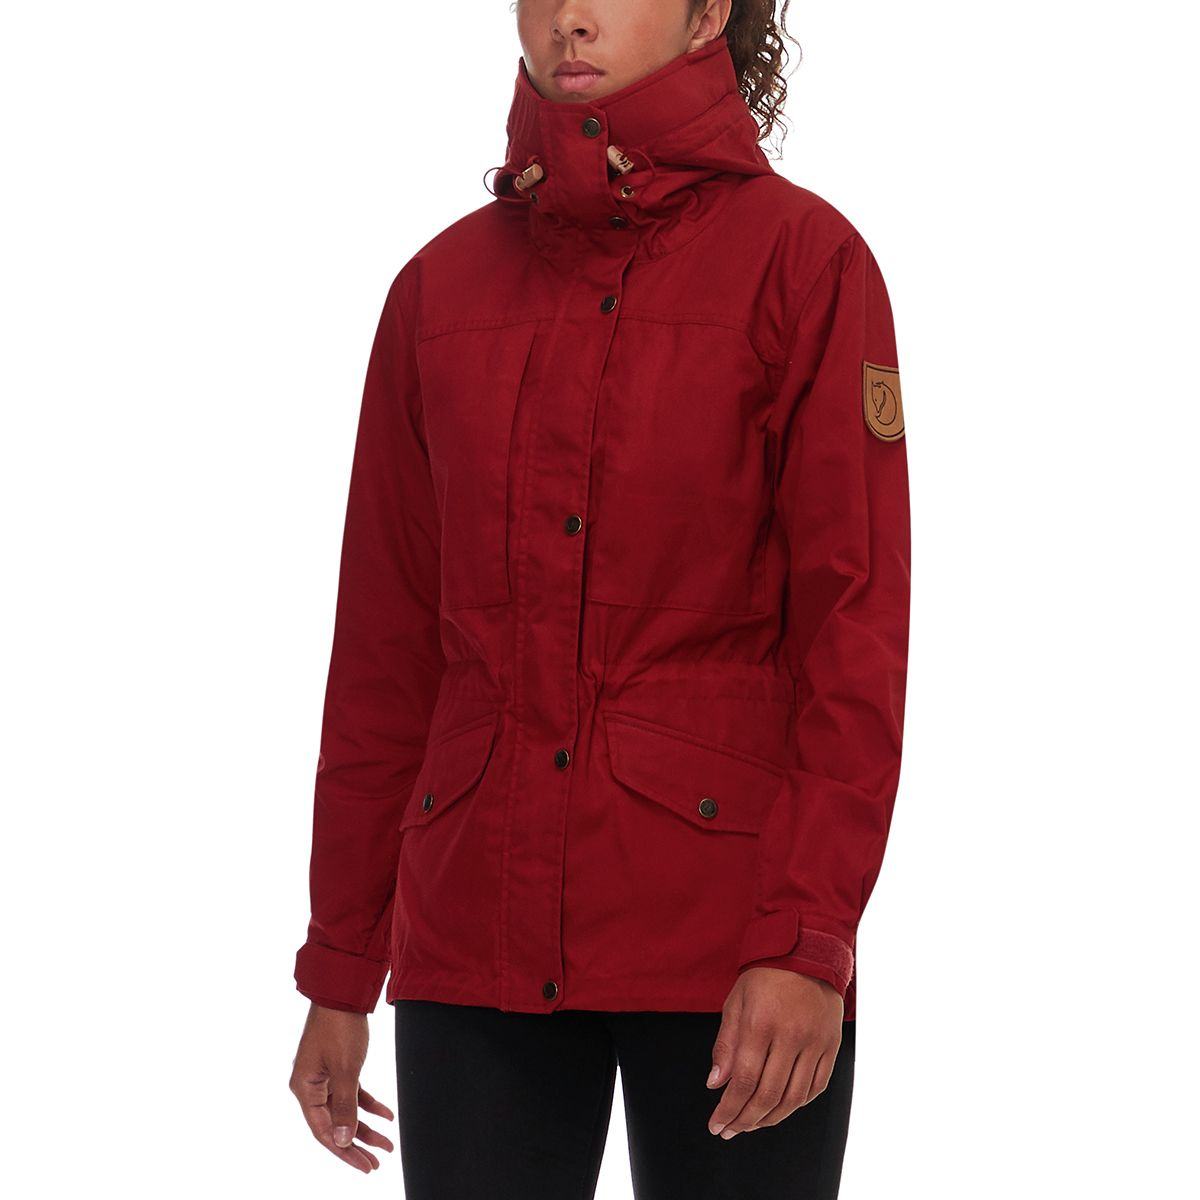 c37107a9a15 Fjallraven Singi Trekking Jacket Womens Deep Red M